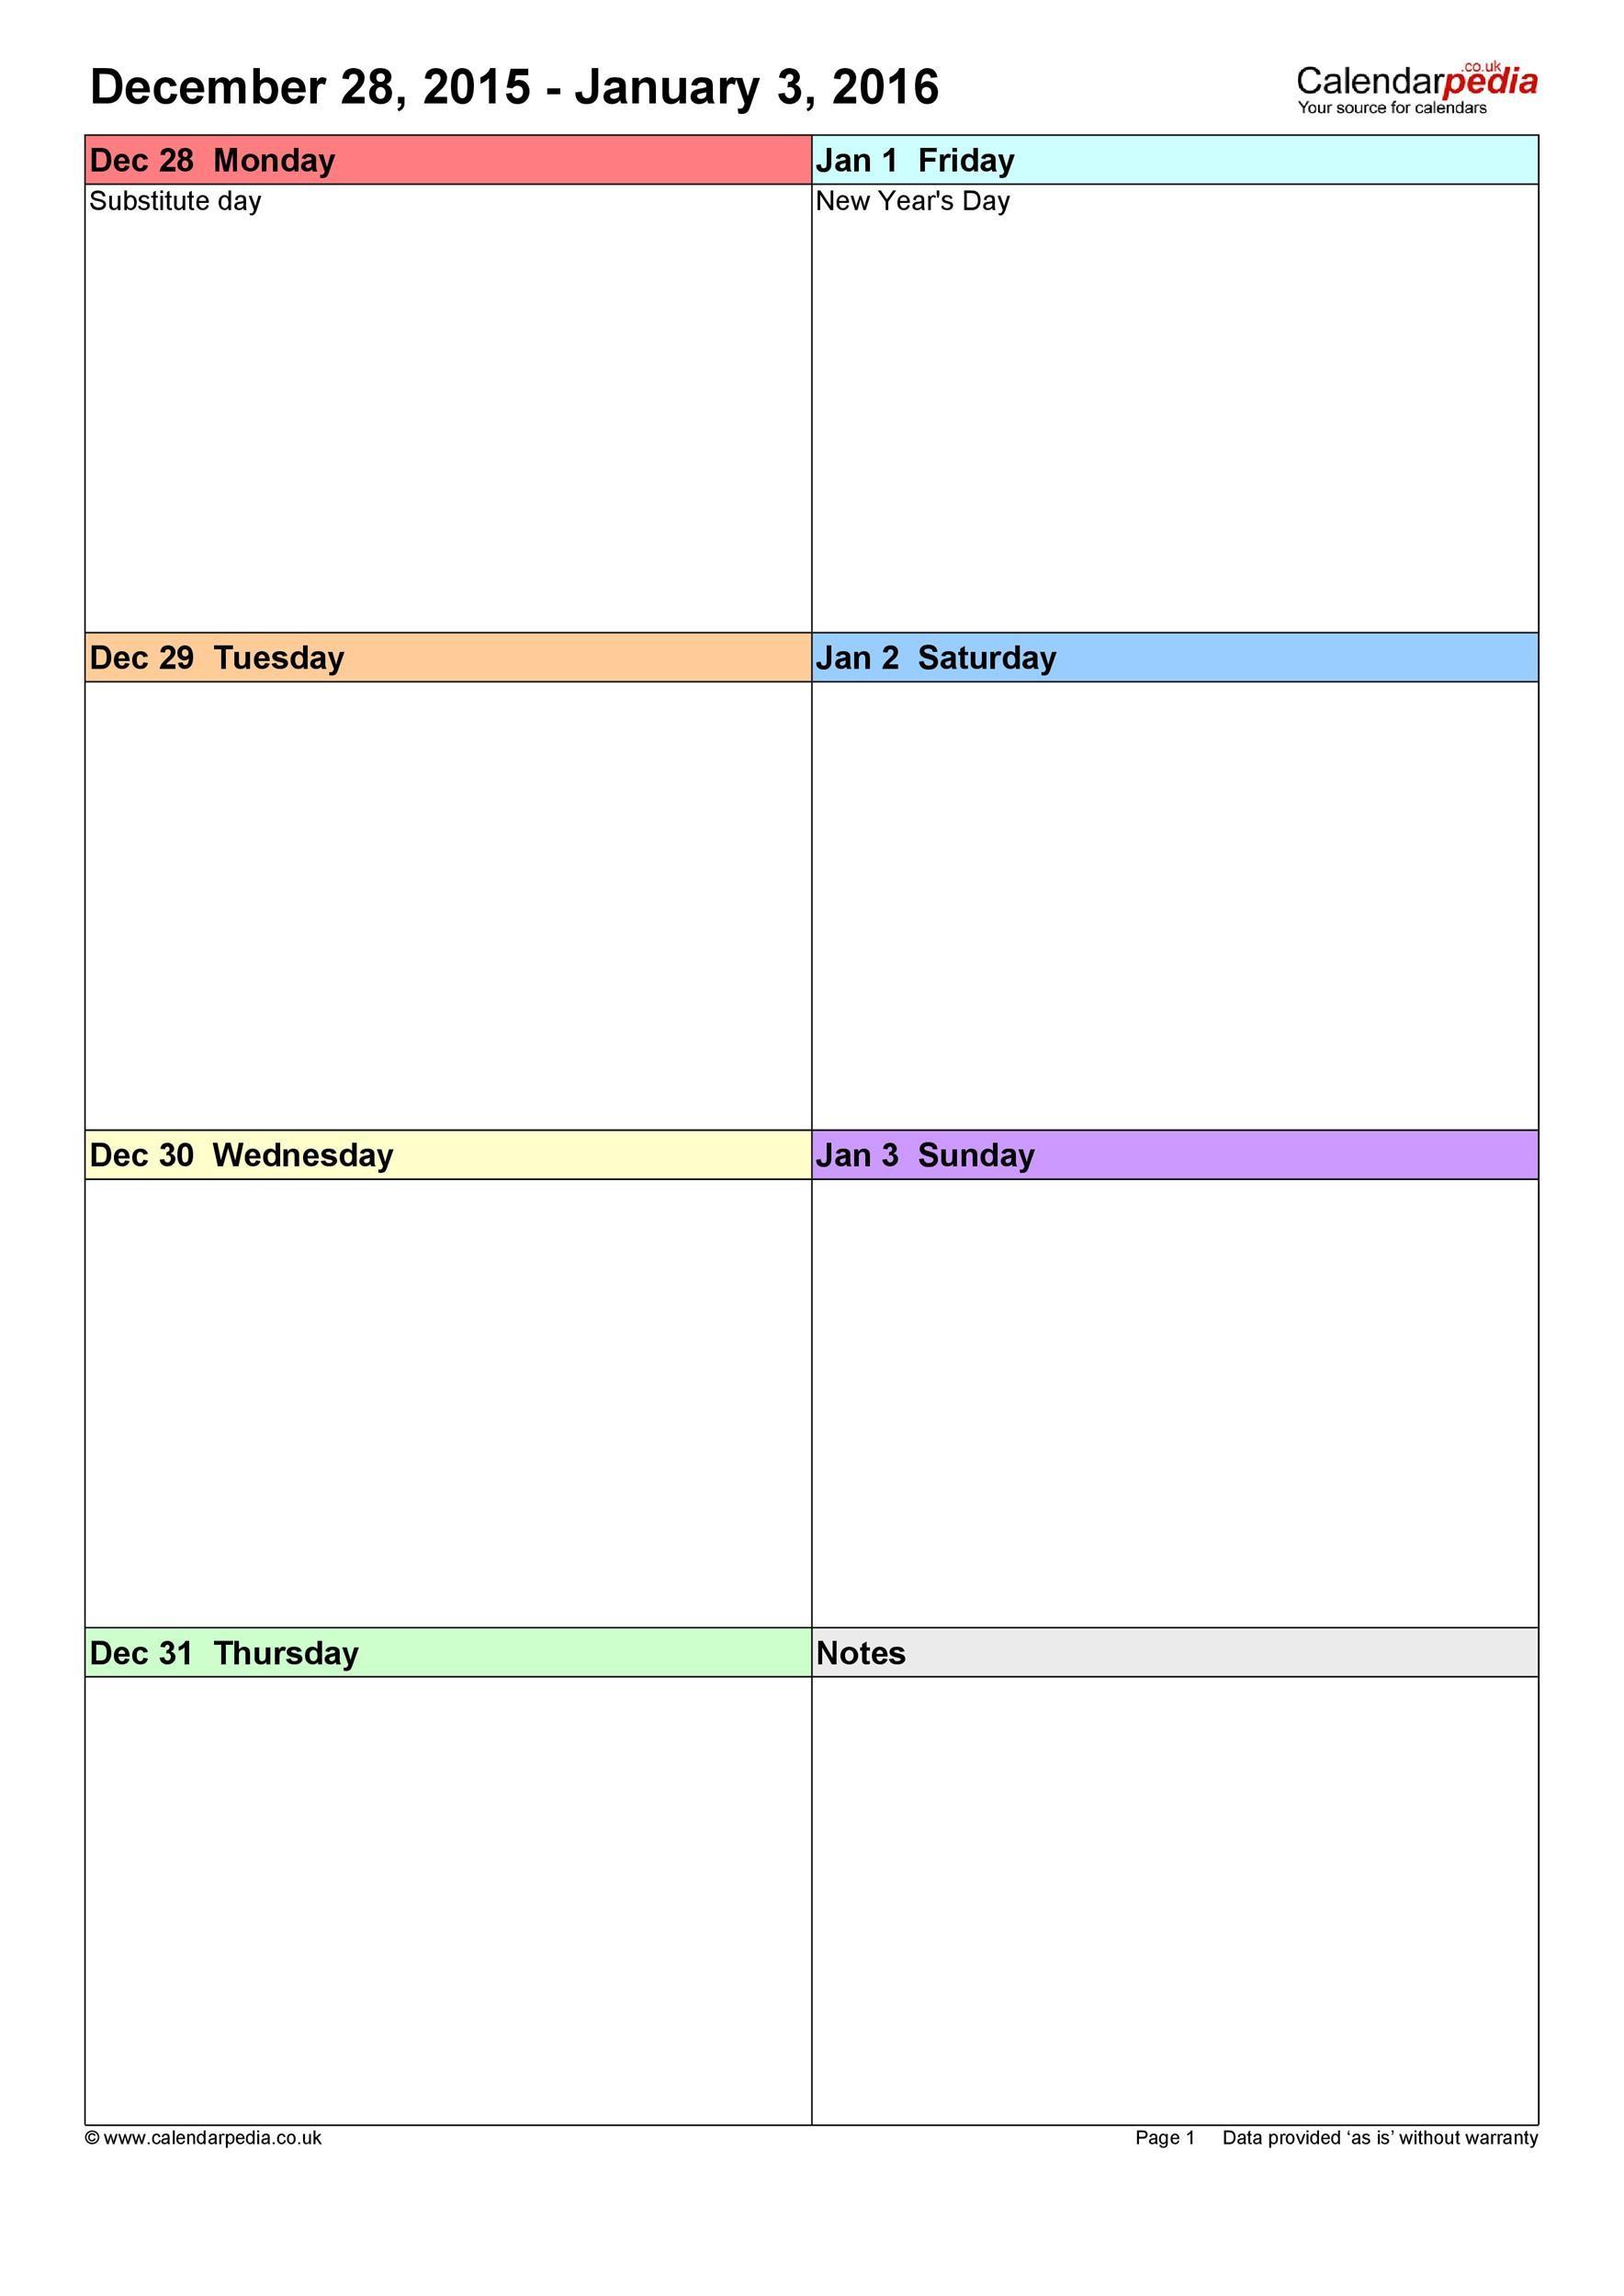 26 Blank Weekly Calendar Templates [Pdf, Excel, Word] ᐅ  Editable 7 Day Planner